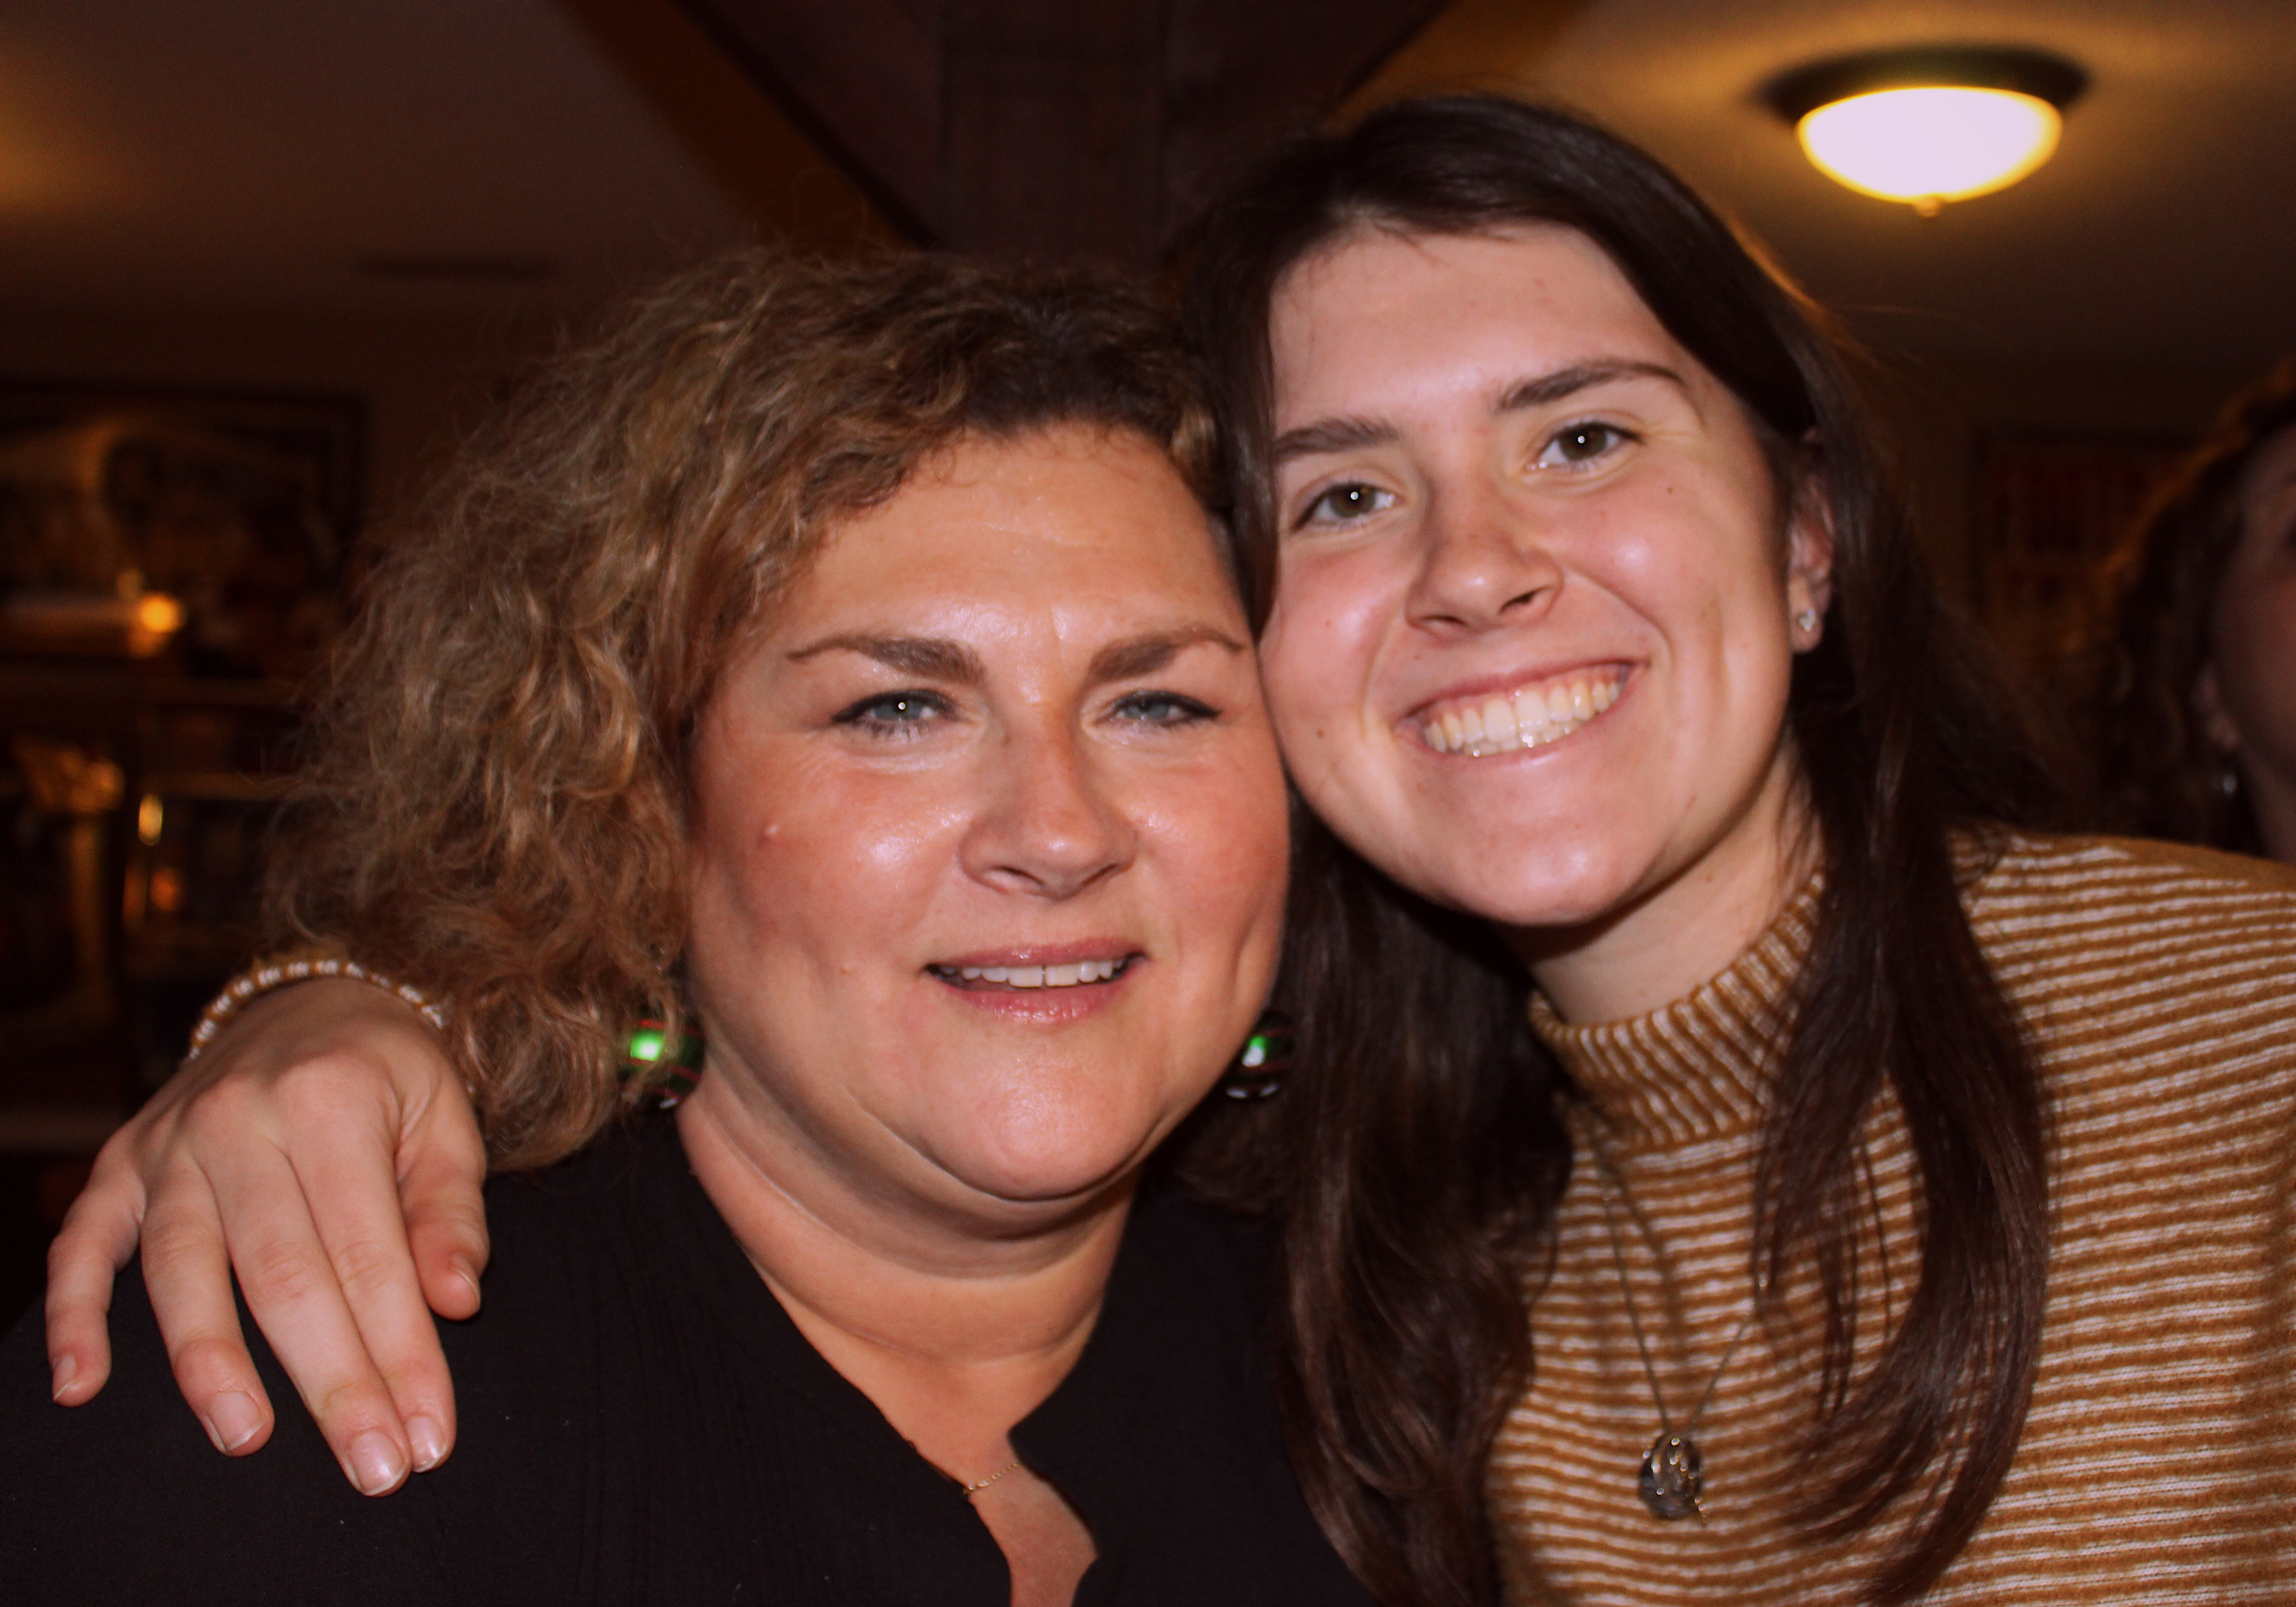 Mom and I - Sydney Herczeg